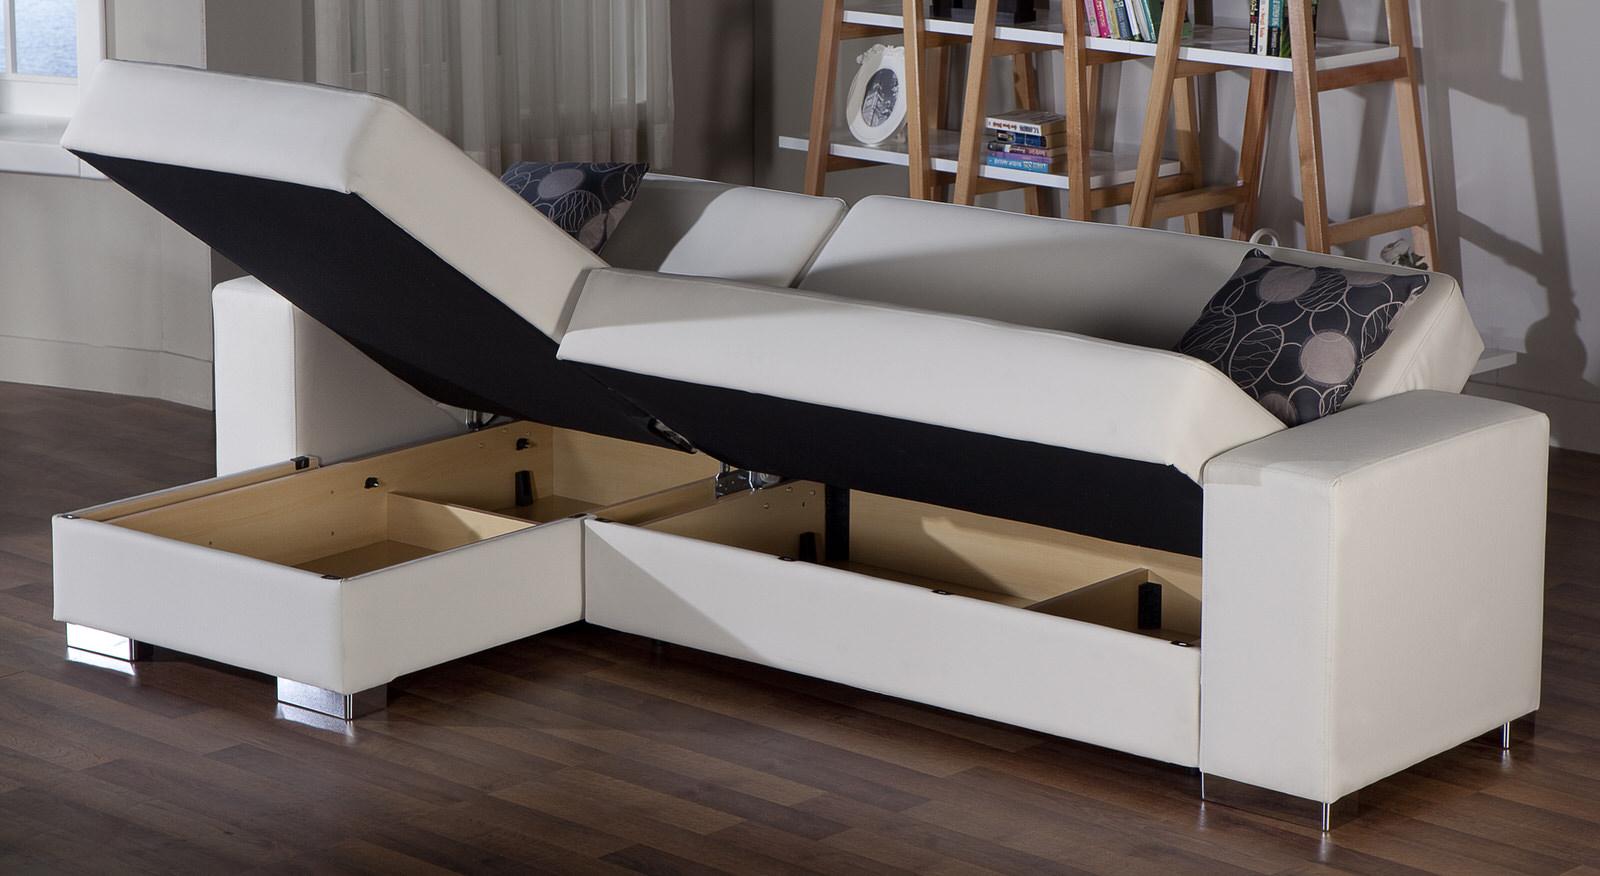 Kobe Escudo Cream Sectional Sofa By Sunset (Sunset International (Istikbal))